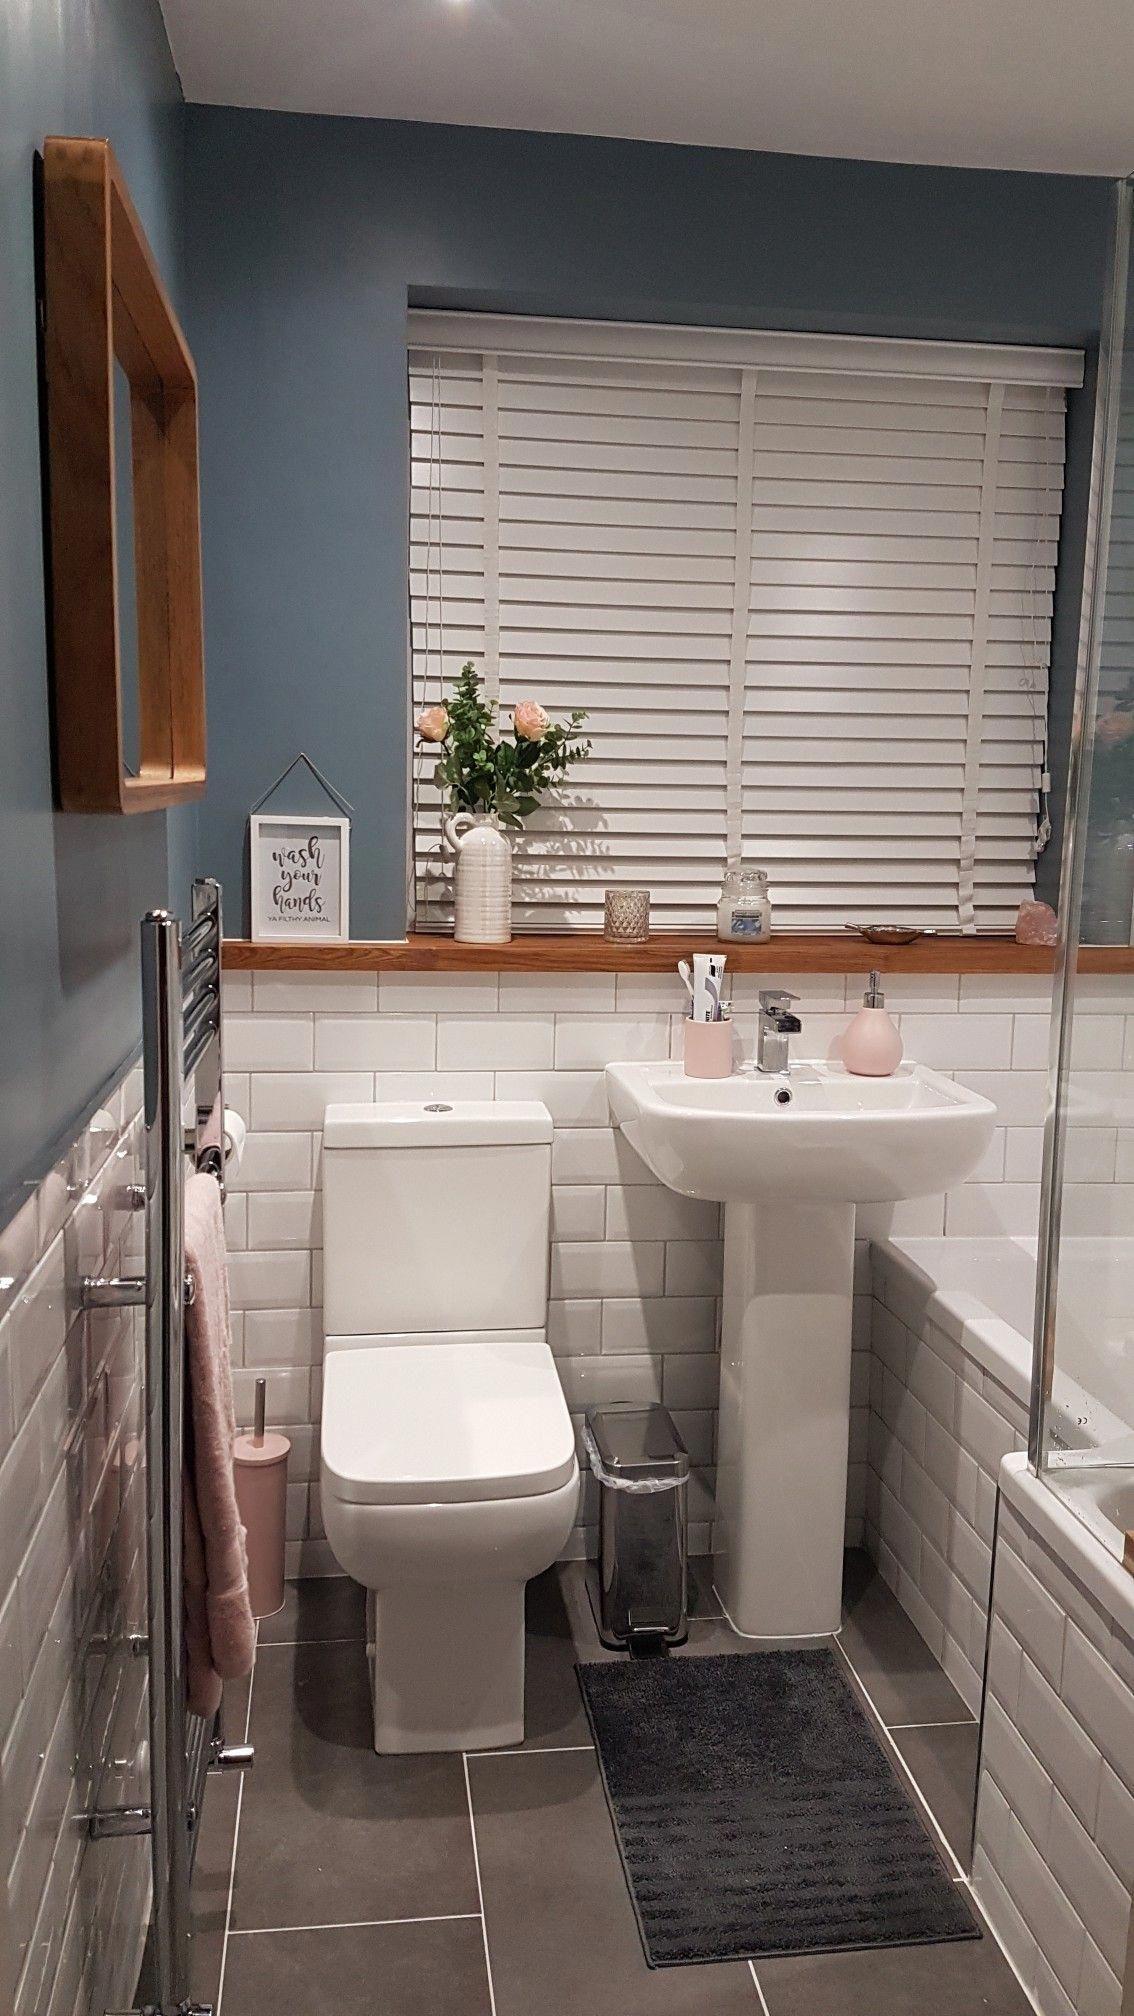 Get Redirected Below Bathroom Remodel Tile Bathroom Design Small Bathroom Interior Small Bathroom